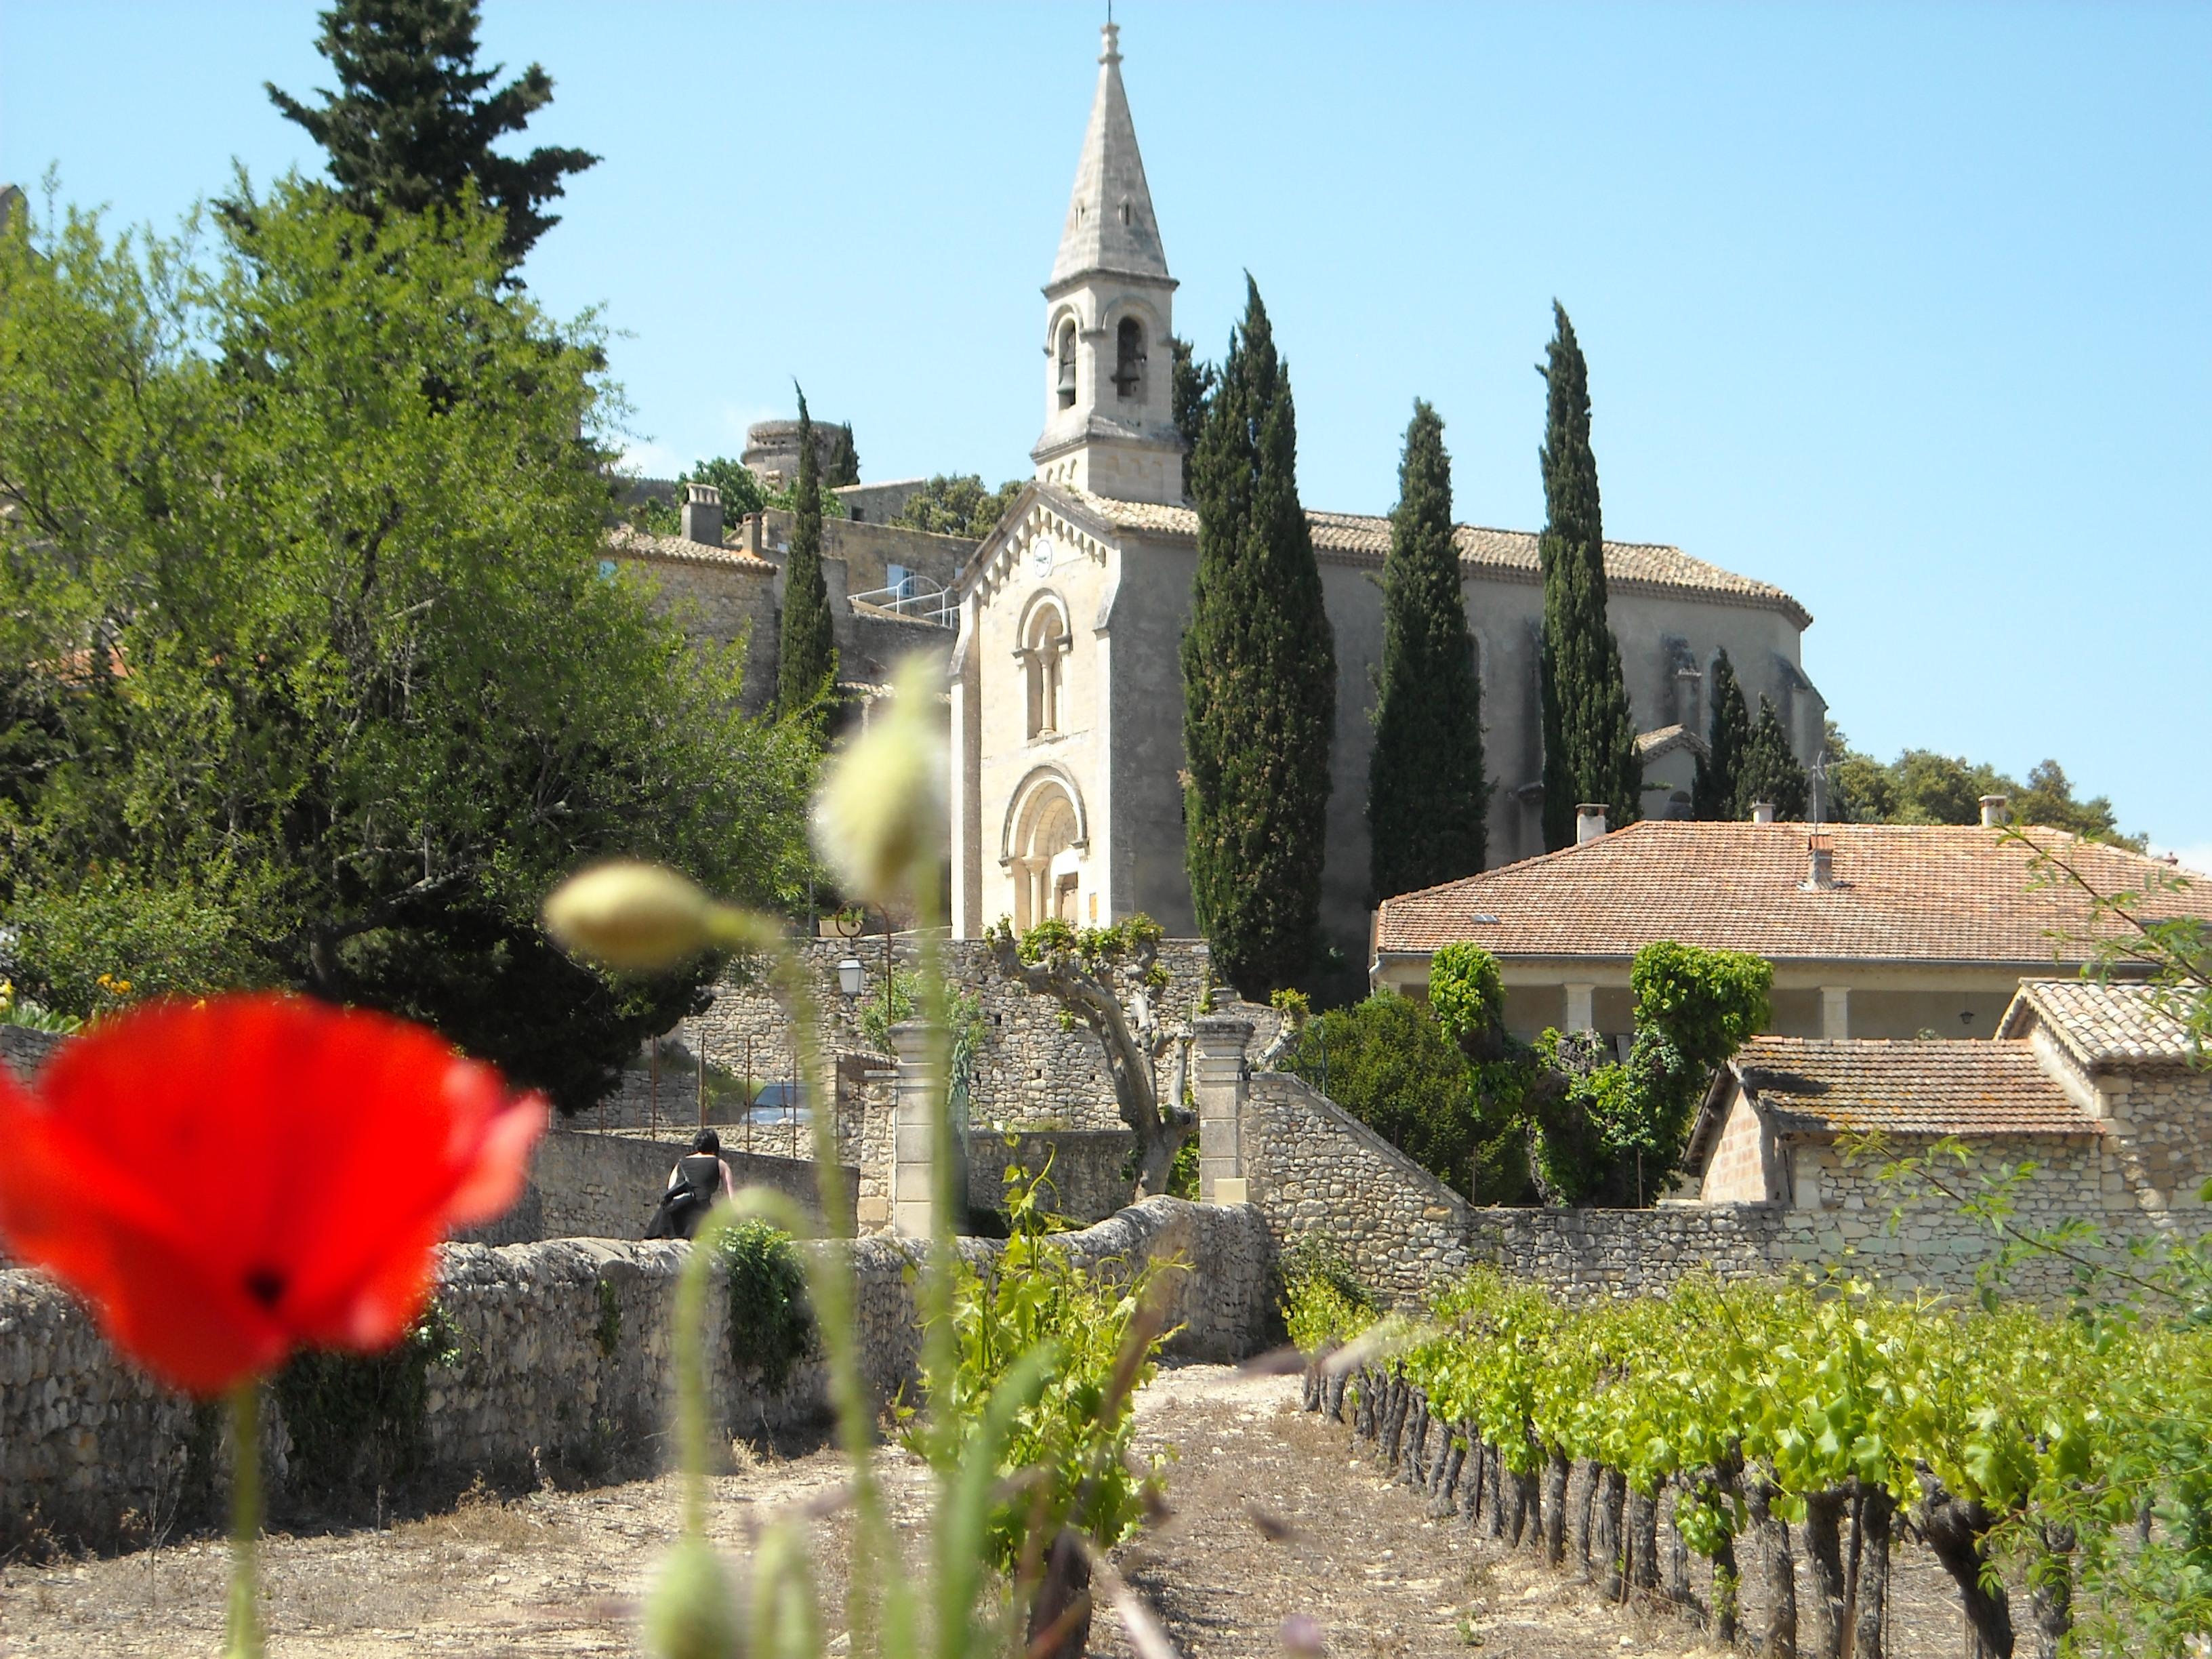 Mooiste dorpen Zuid-Frankrijk